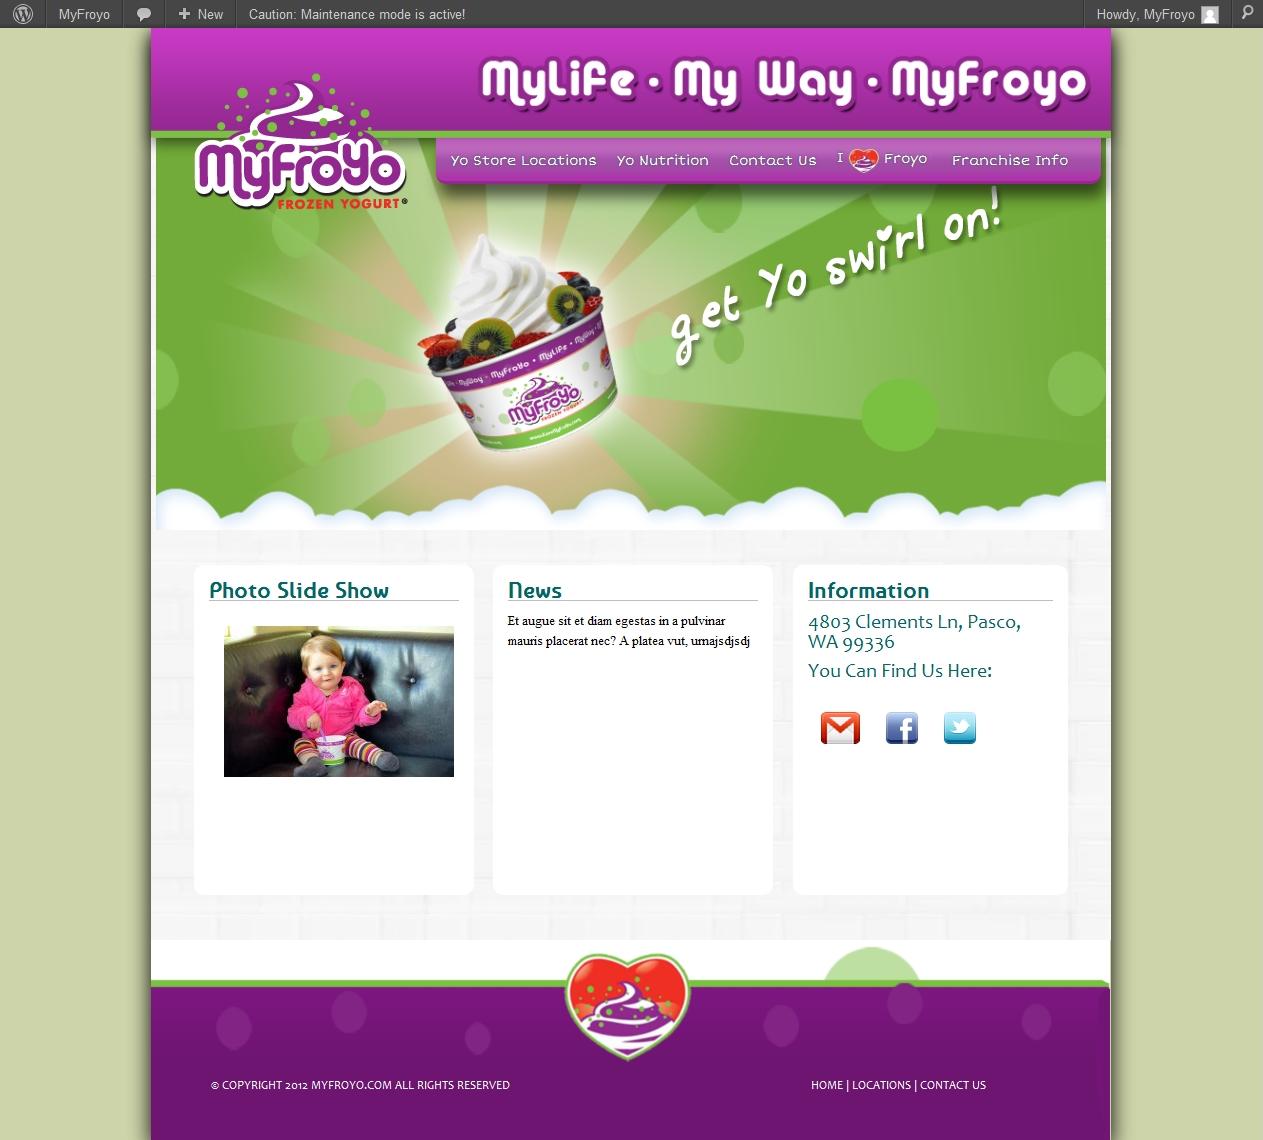 MyFroyo website developed by Web Base Solutions